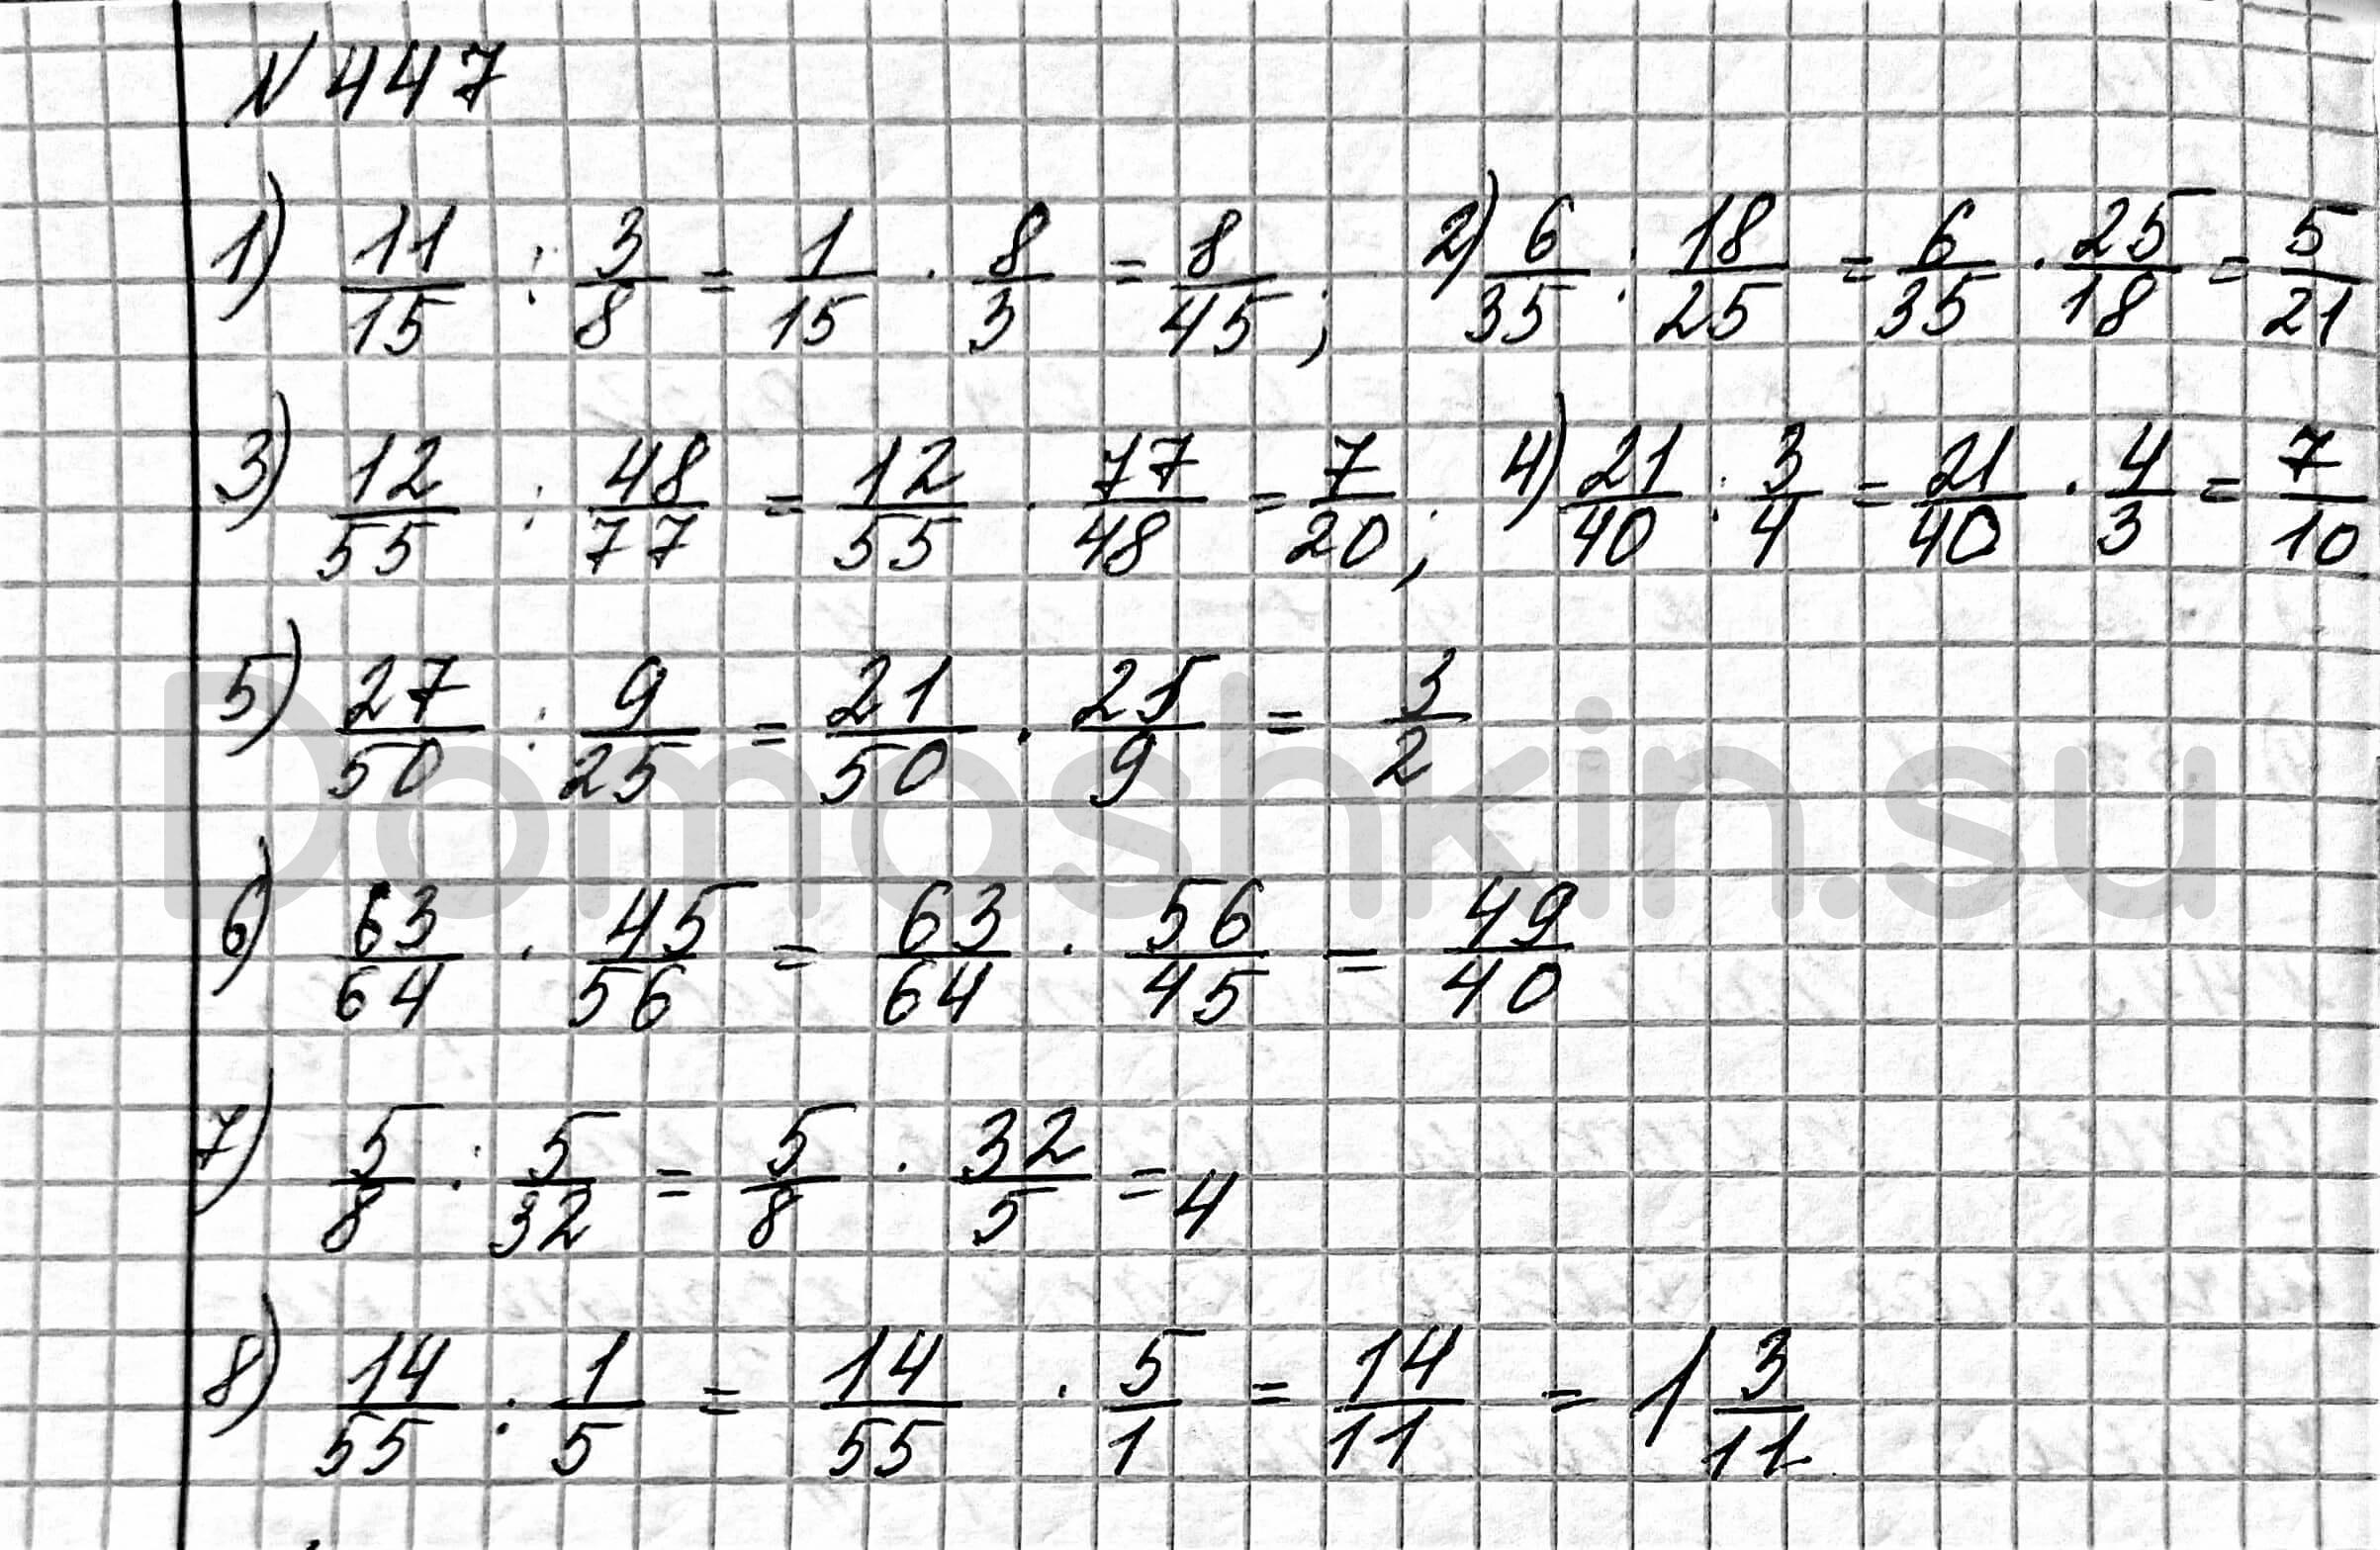 Математика 6 класс учебник Мерзляк номер 447 решение